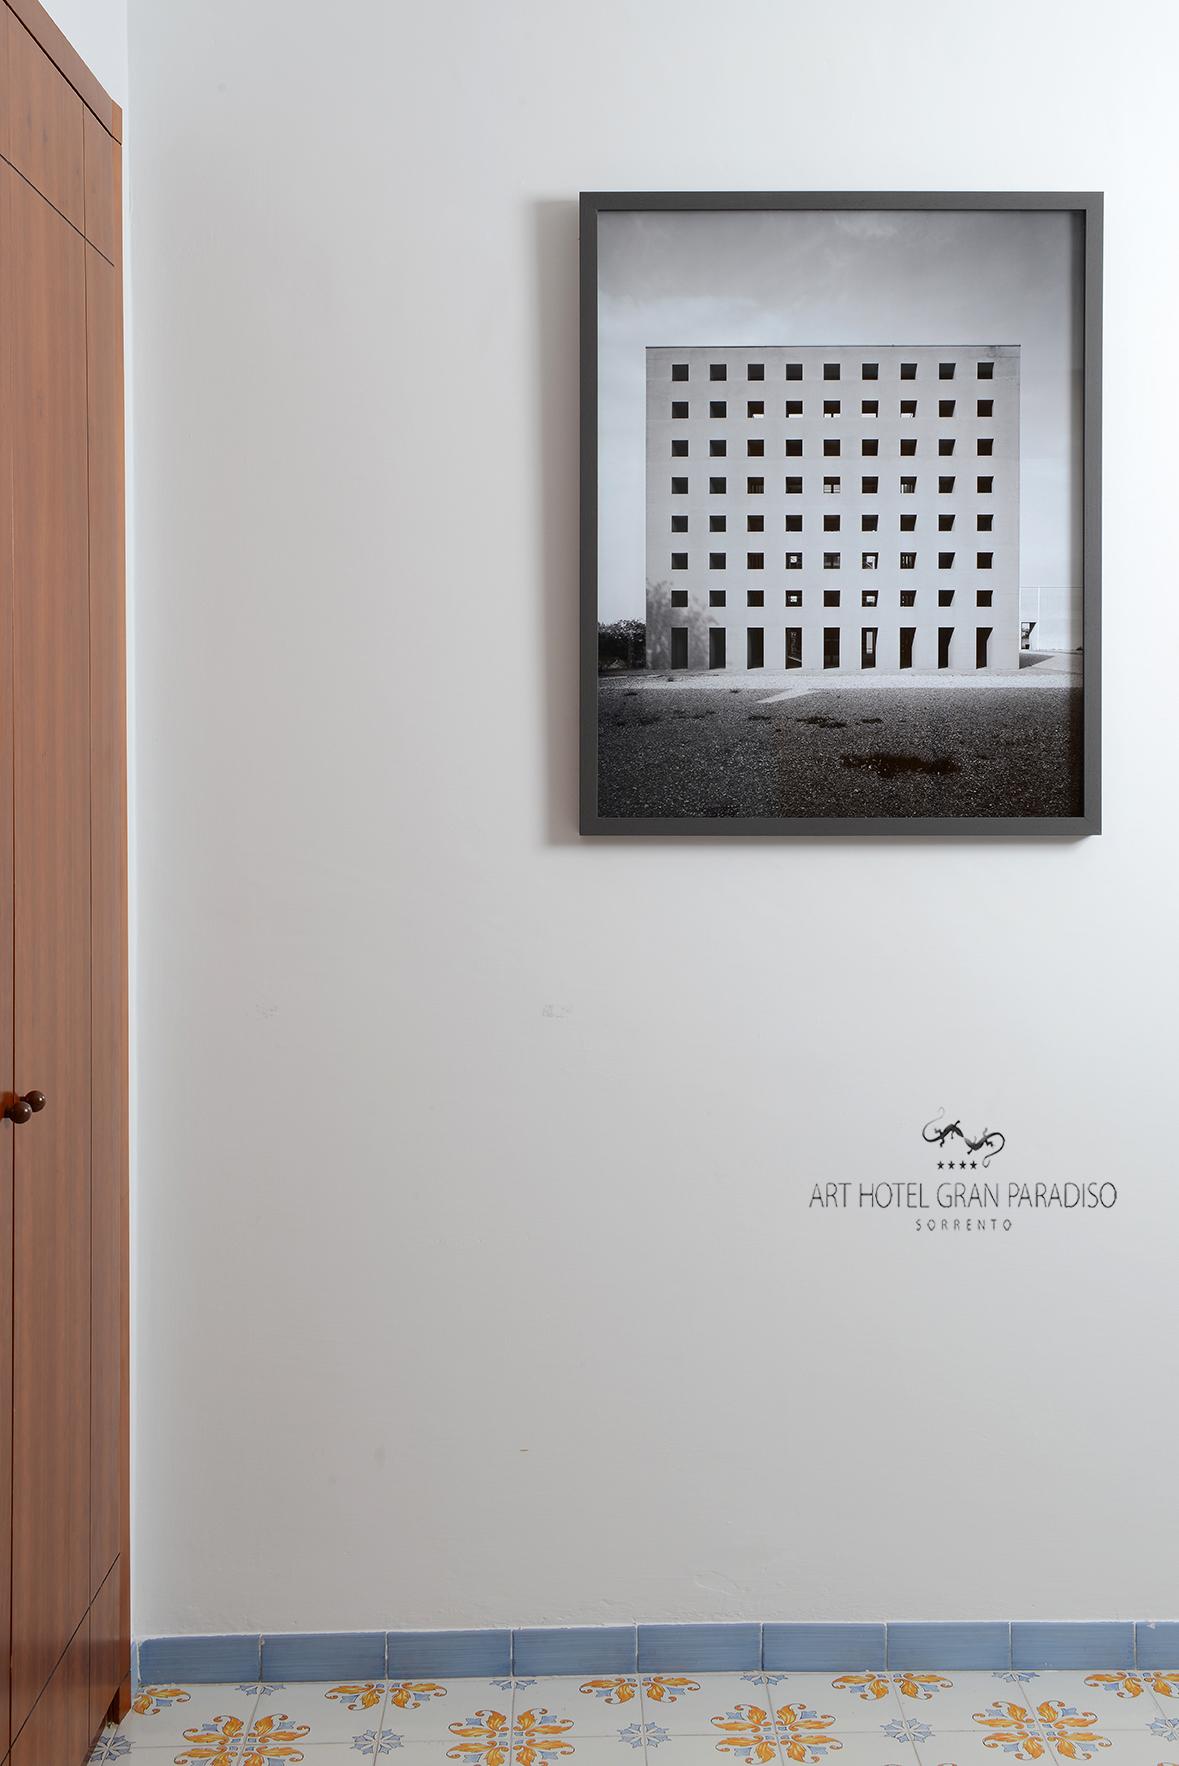 Art_Hotel_Gran_Paradiso_2013_316_Gabriele_Basilico_2.jpg